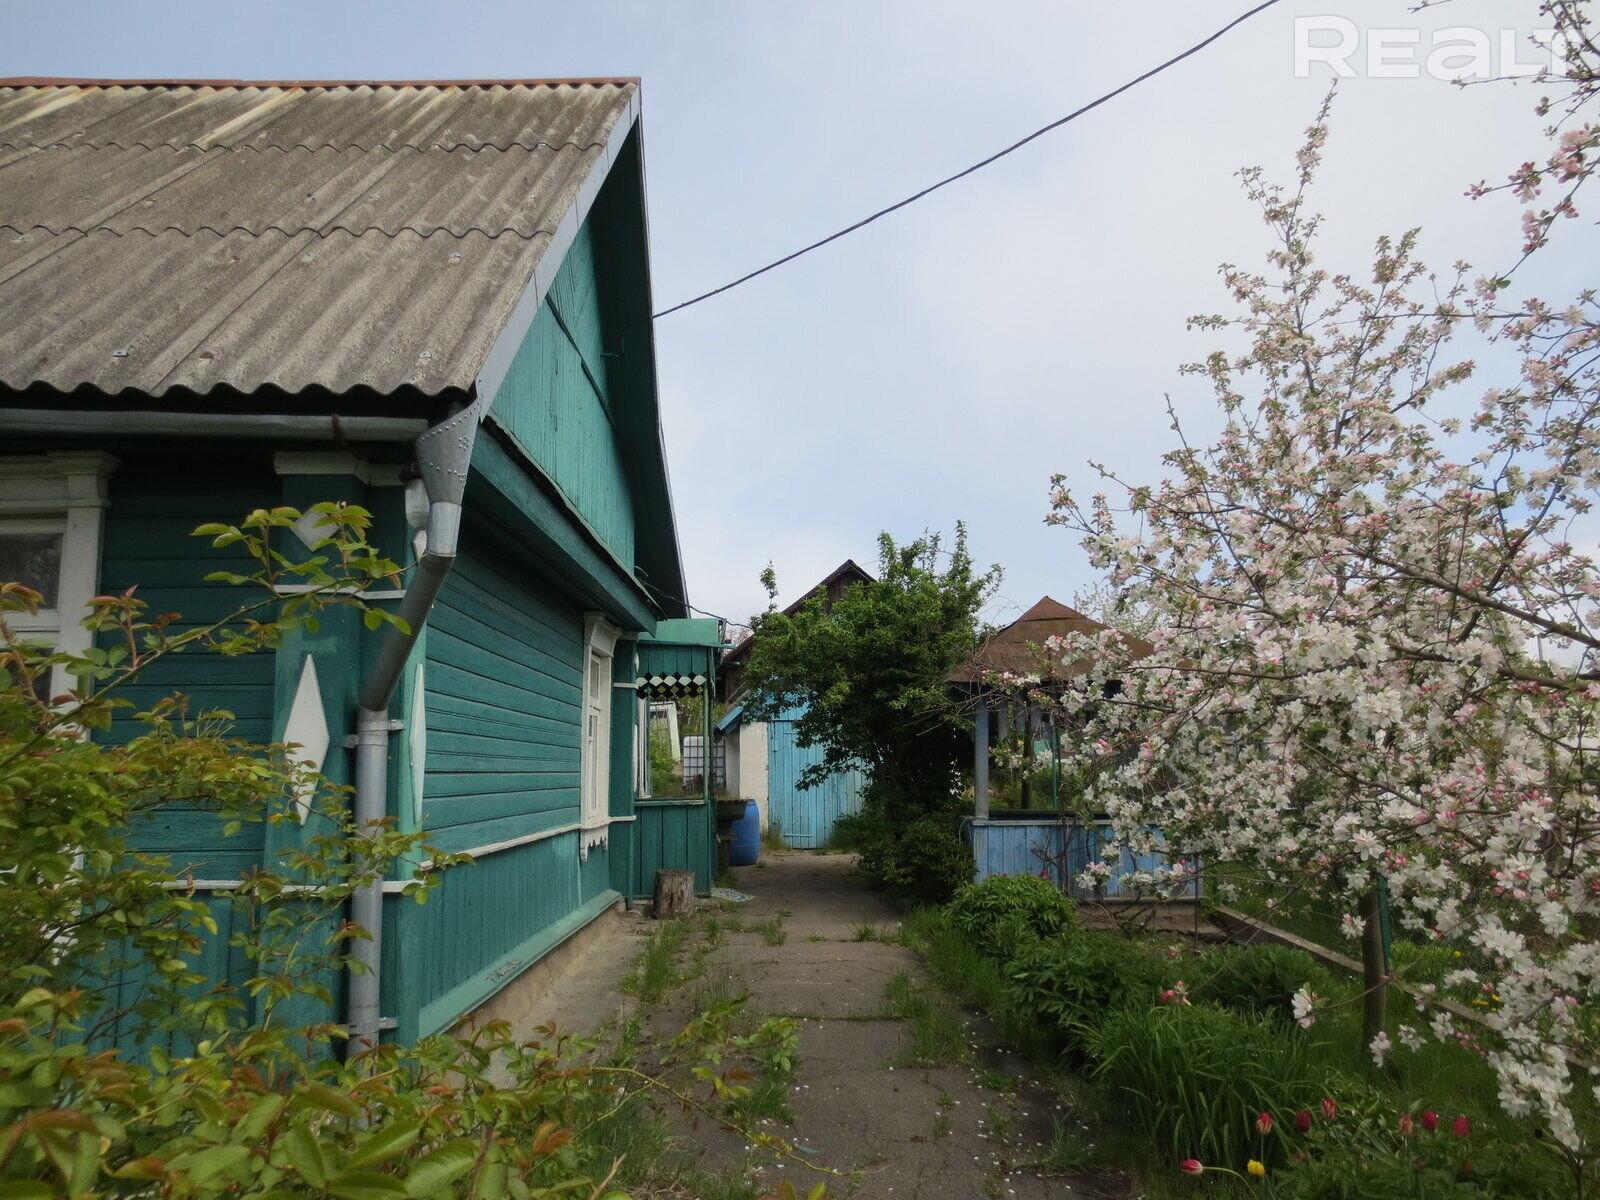 Продается 2-х комнатная квартира, Заславль - фото №2